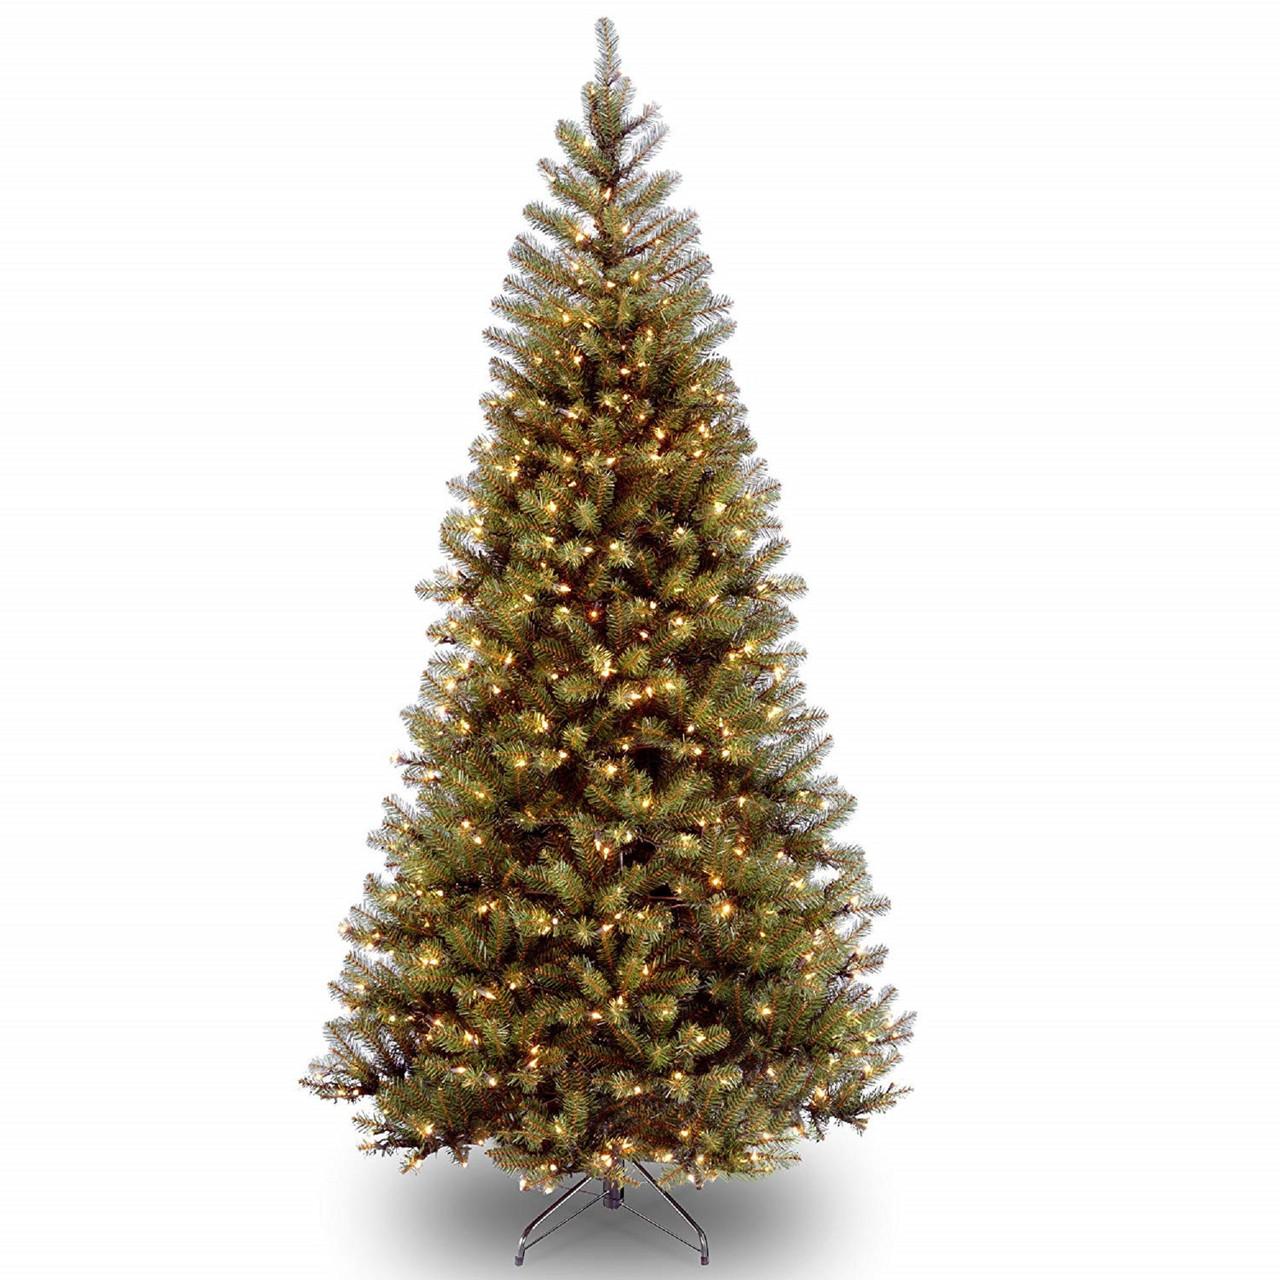 75 x 48 pre lit medium pine aspen spruce artificial christmas tree - 75 Pre Lit Christmas Tree